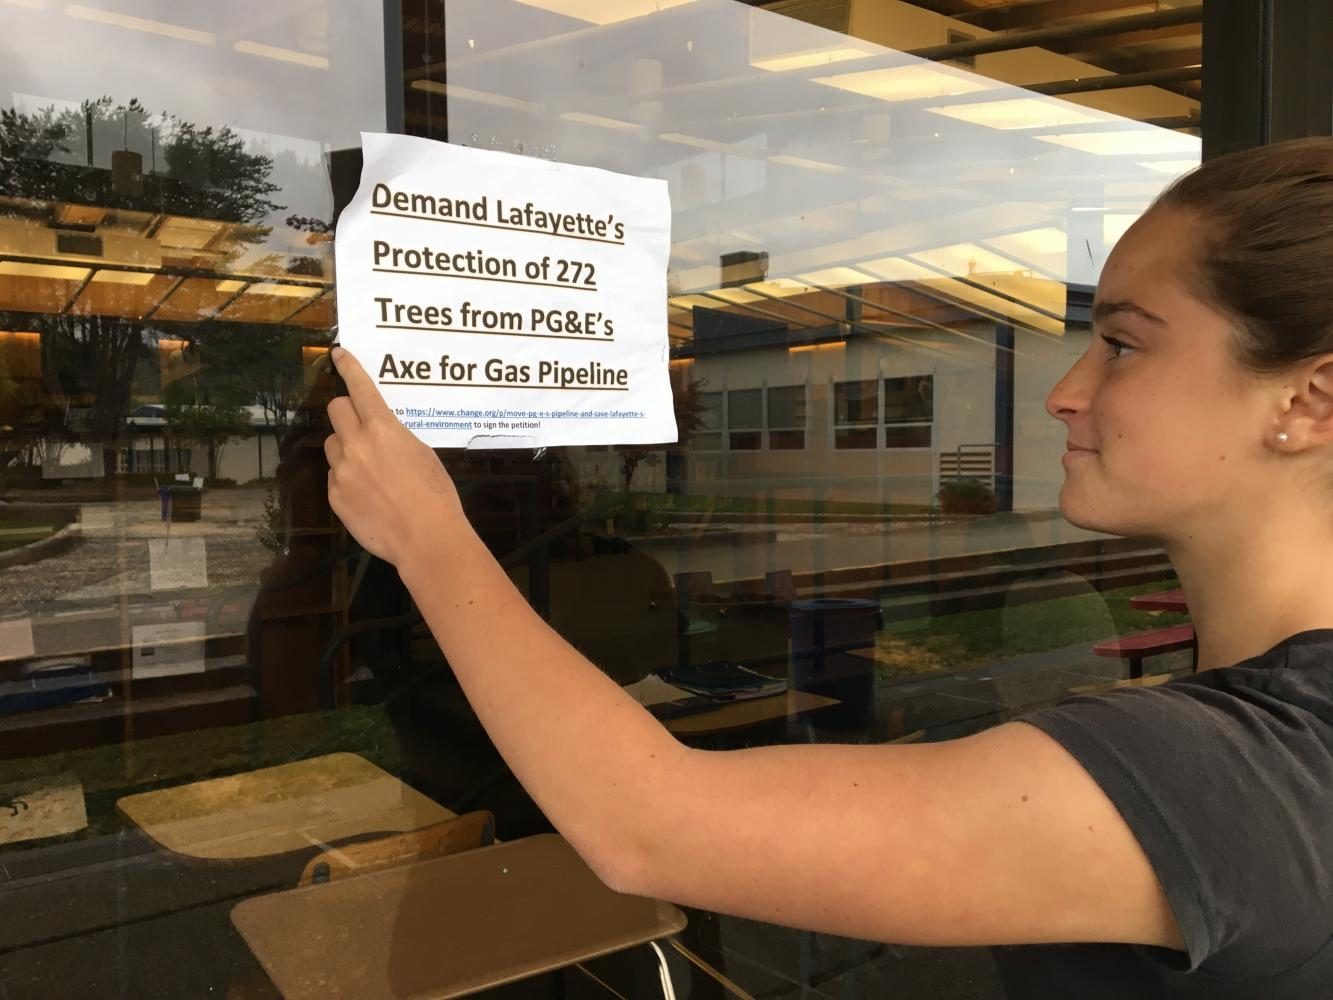 Pipeline Installation Threatens Lafayette Trees